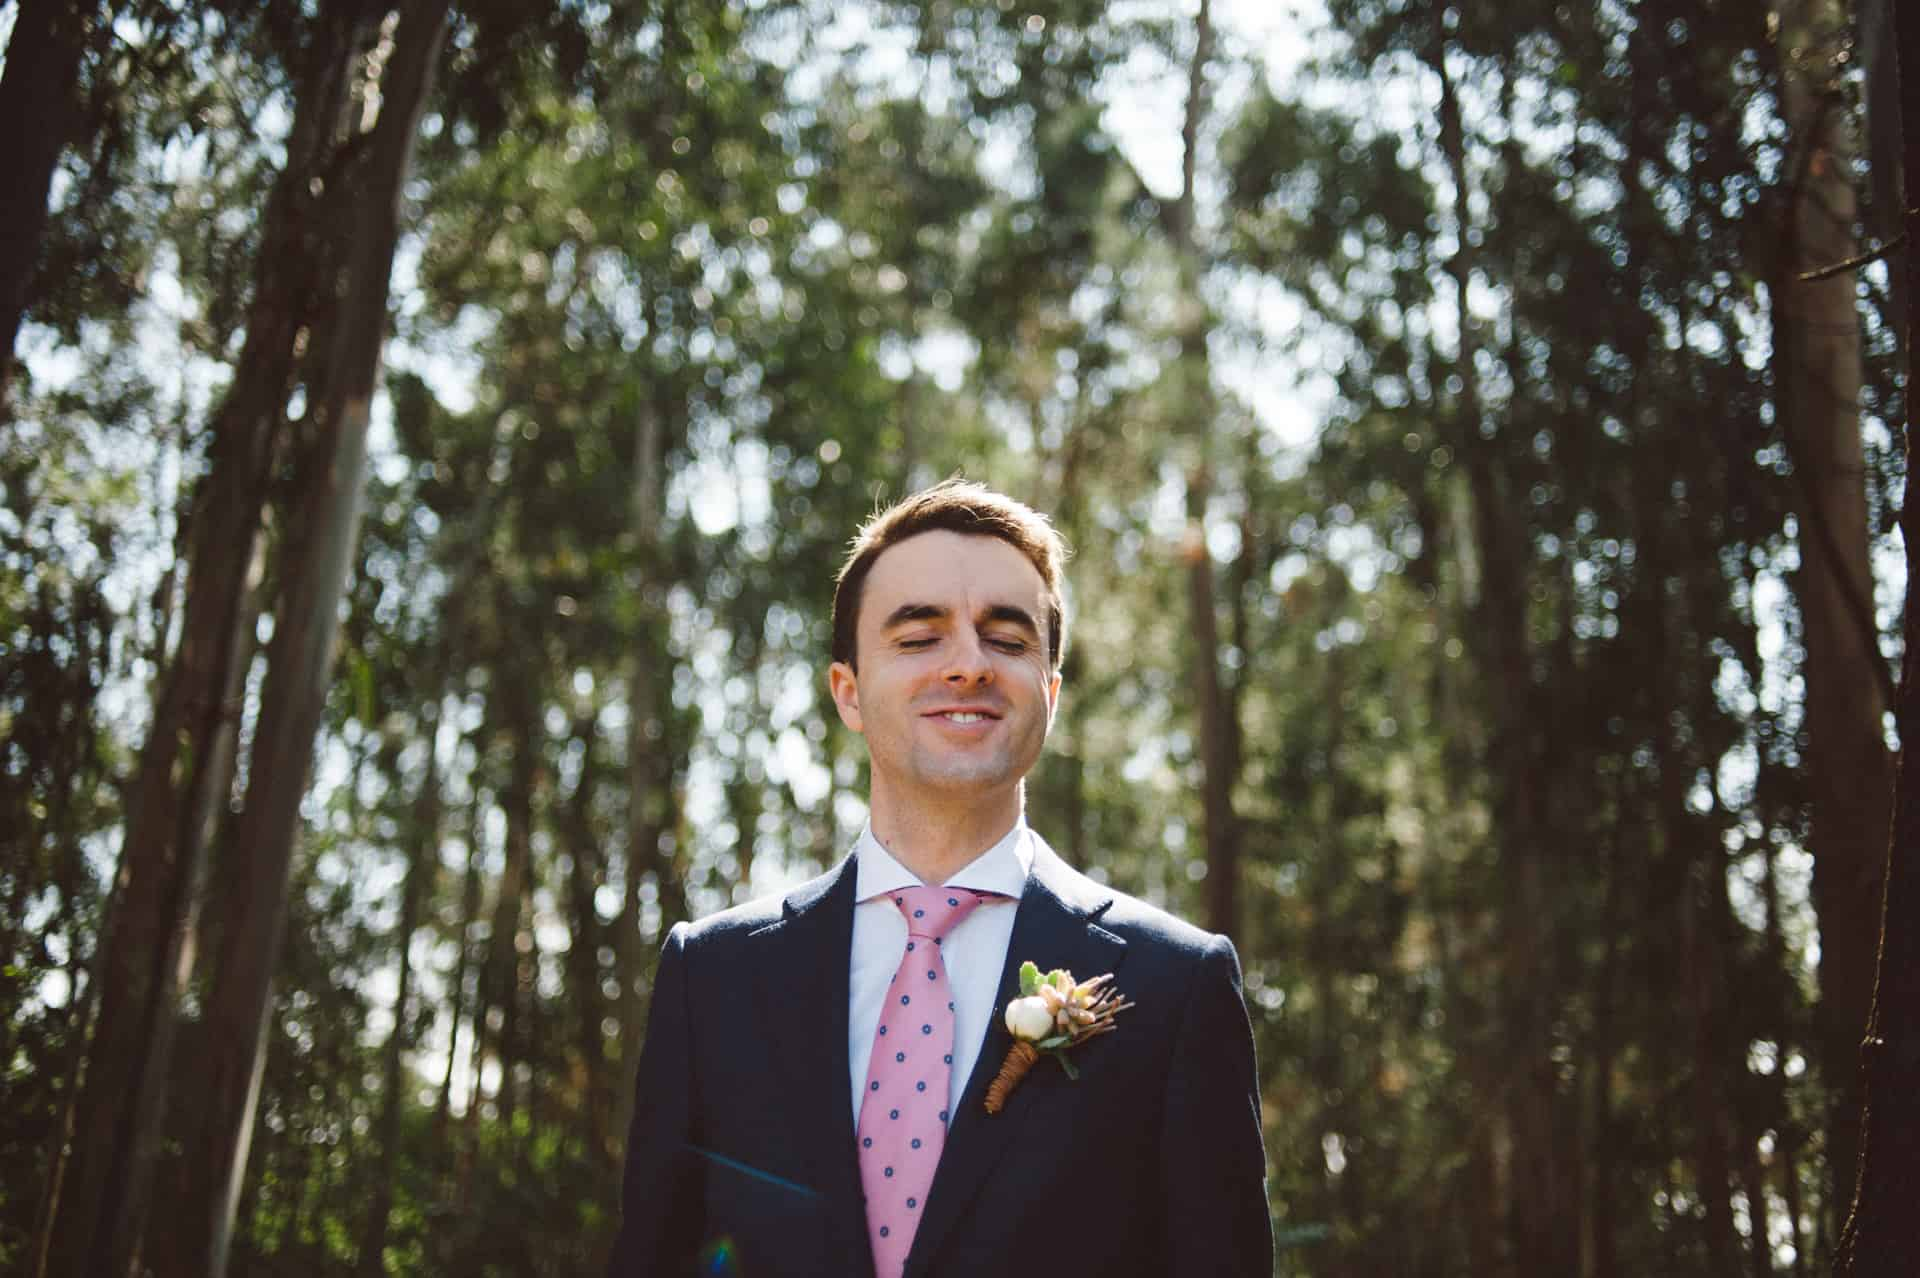 Best wedding images 2015